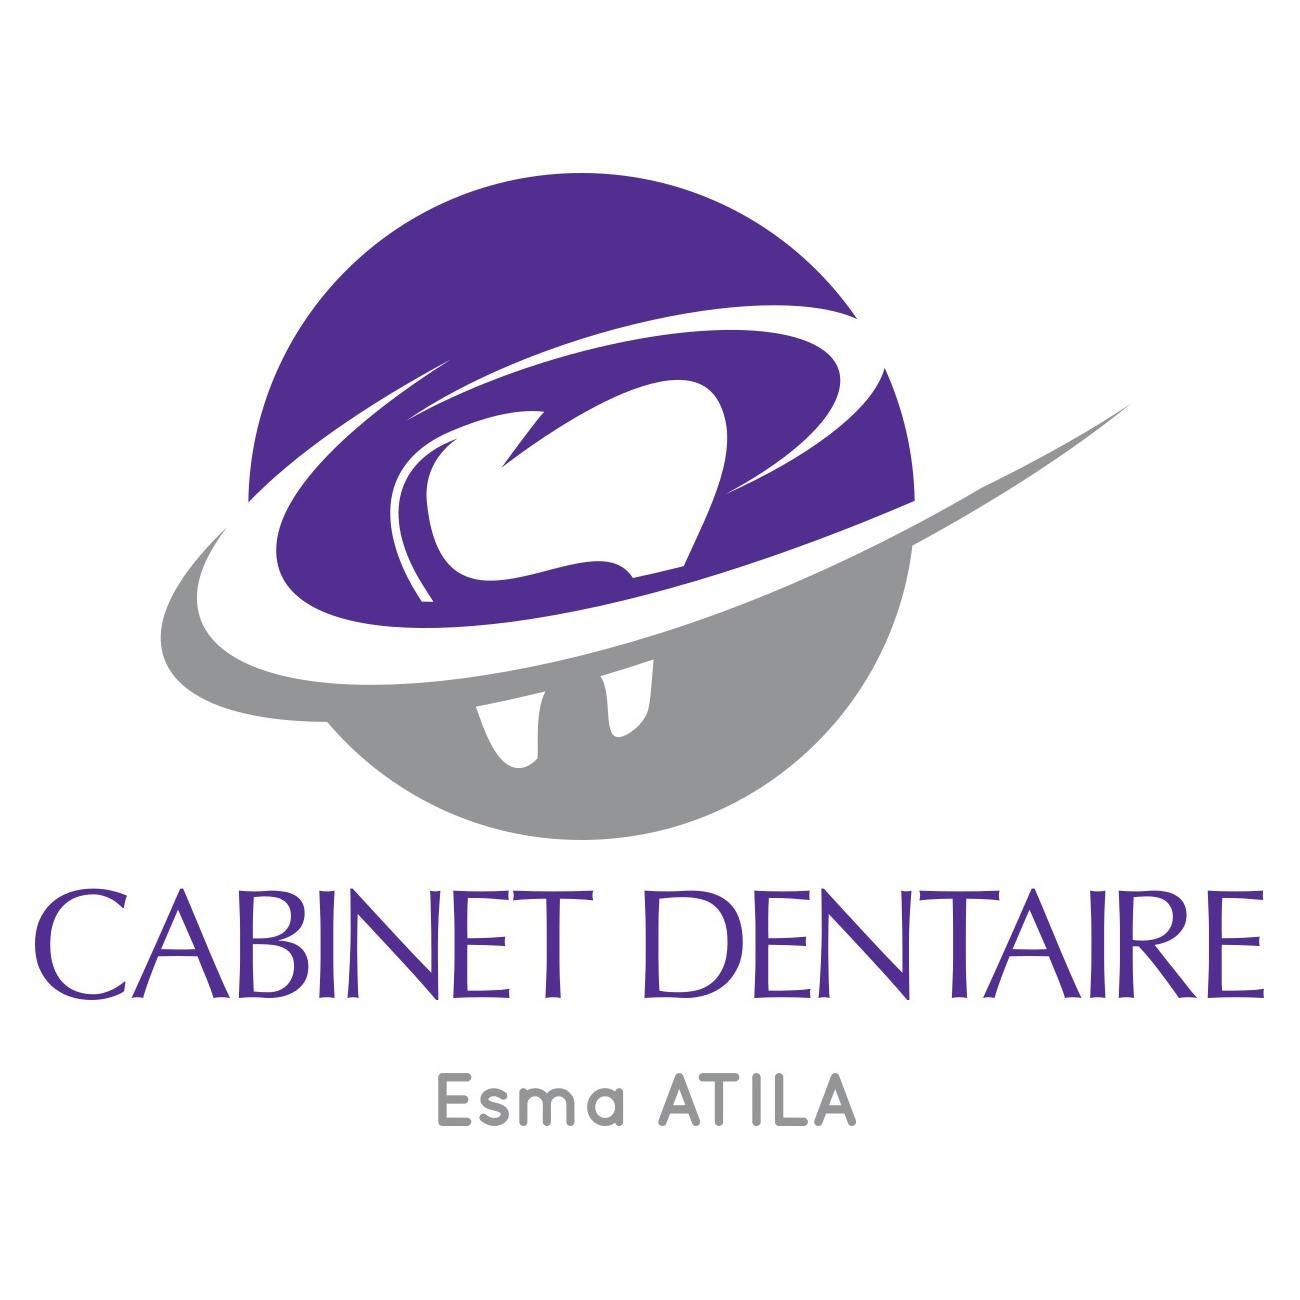 Cabinet dentaire ATILA Esma